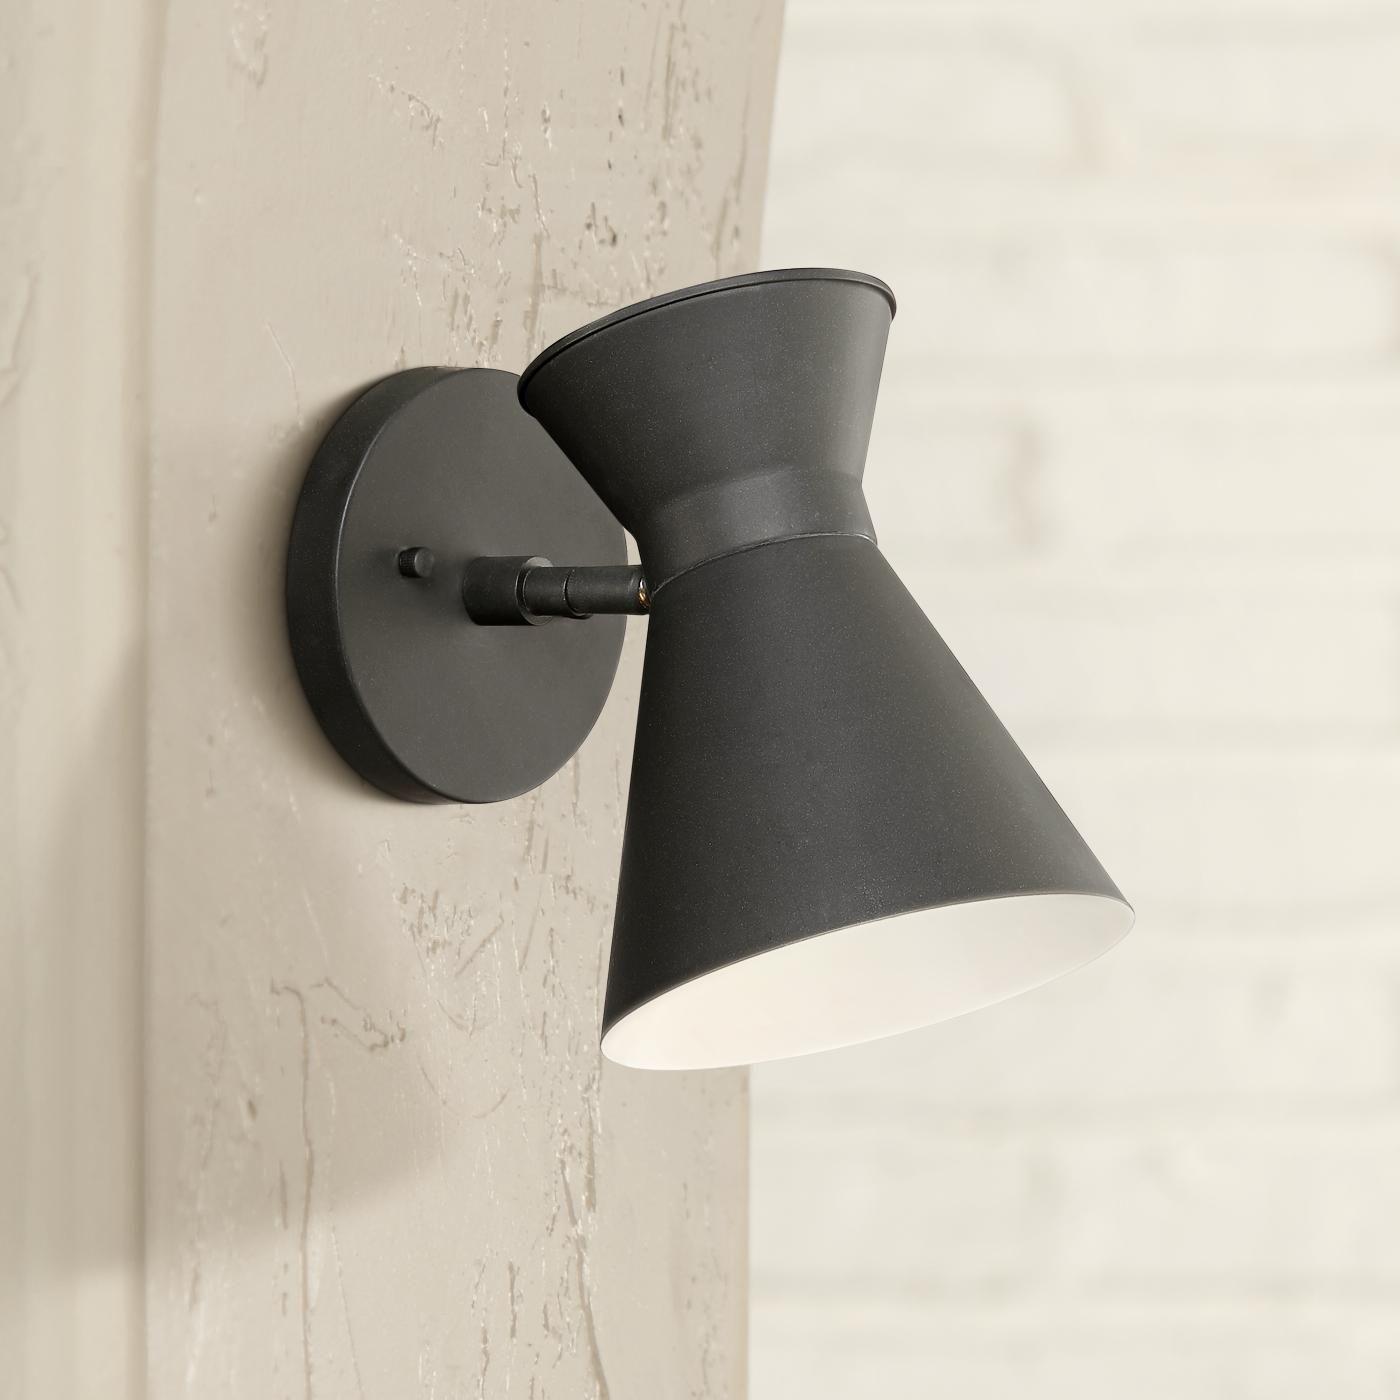 Vance 8 Inch High Black Led Outdoor Wall Light Led Outdoor Wall Lights Outdoor Wall Lighting Outdoor Wall Light Fixtures